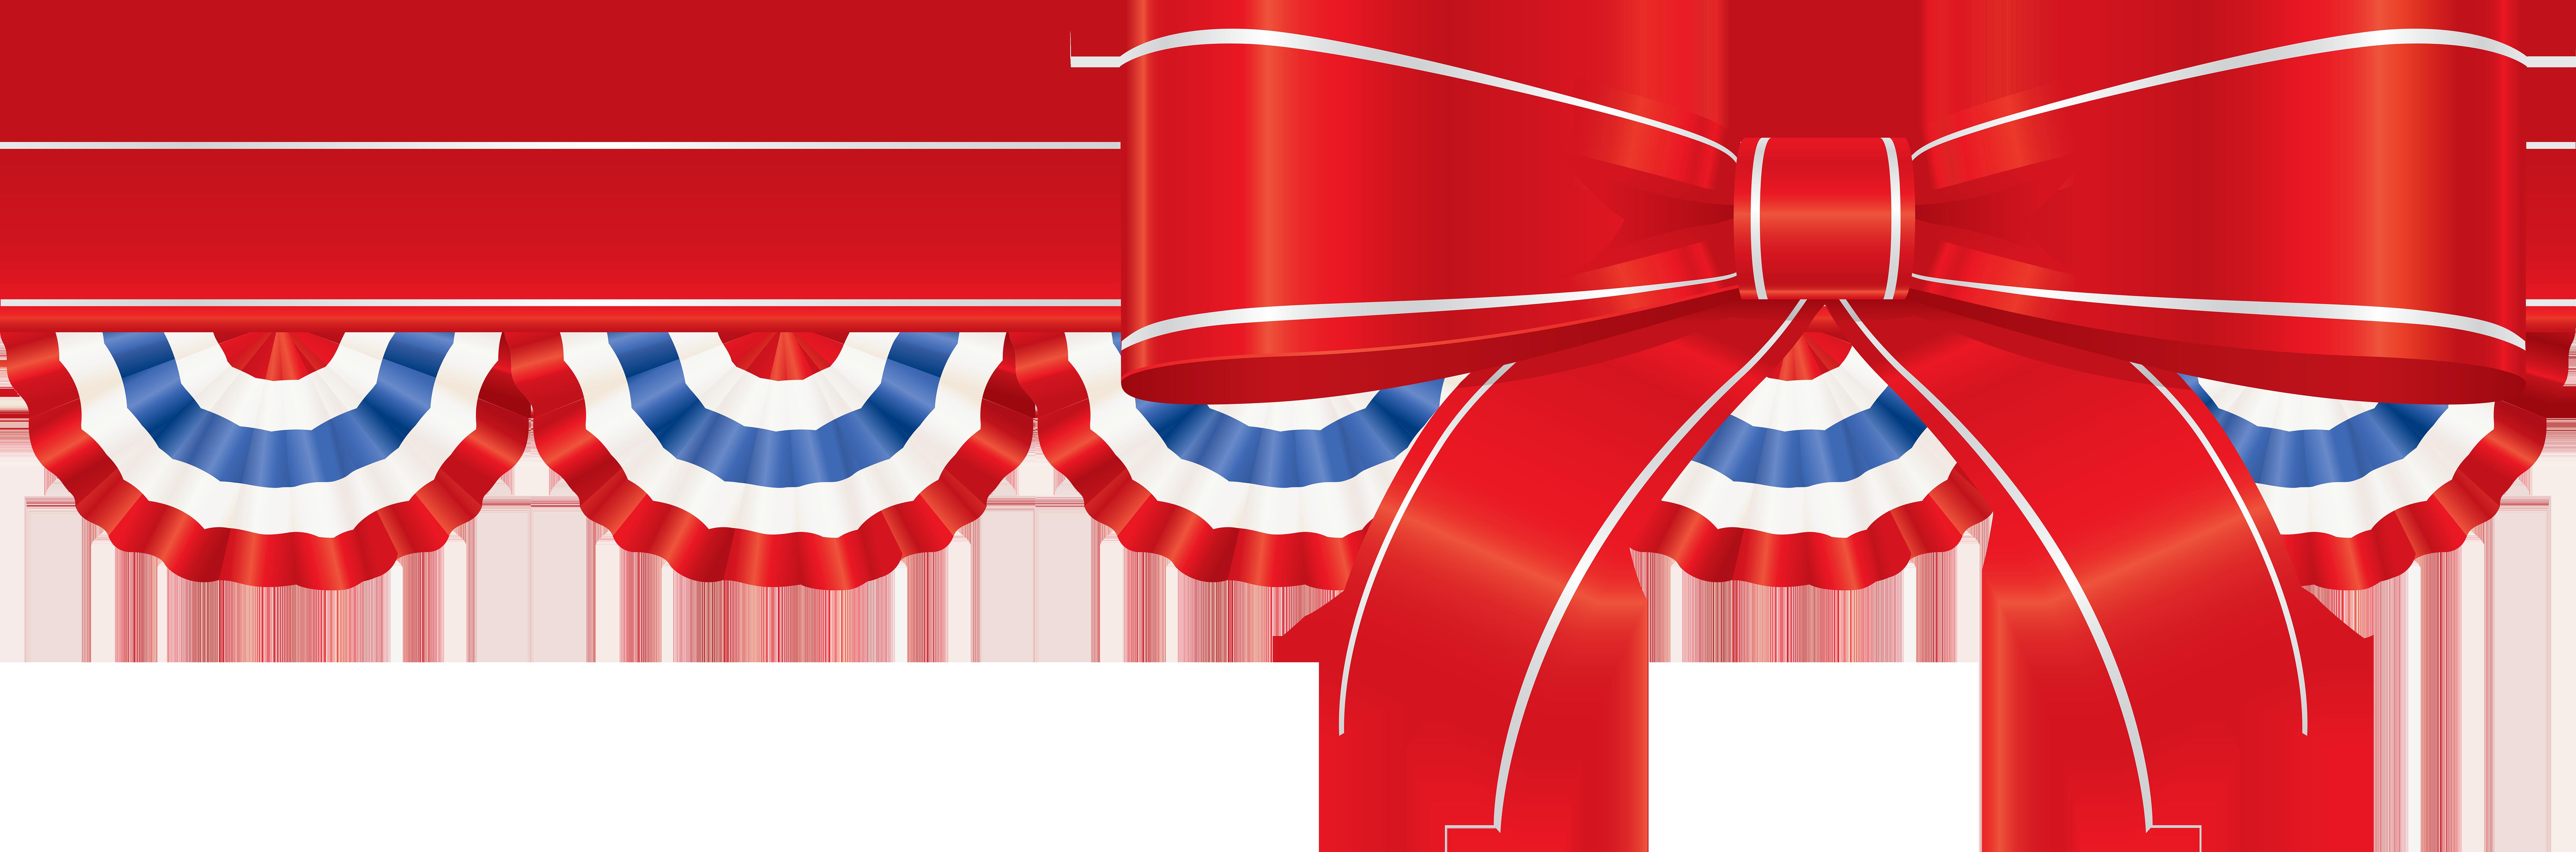 image transparent stock America clipart. Ribbon decor png clip.